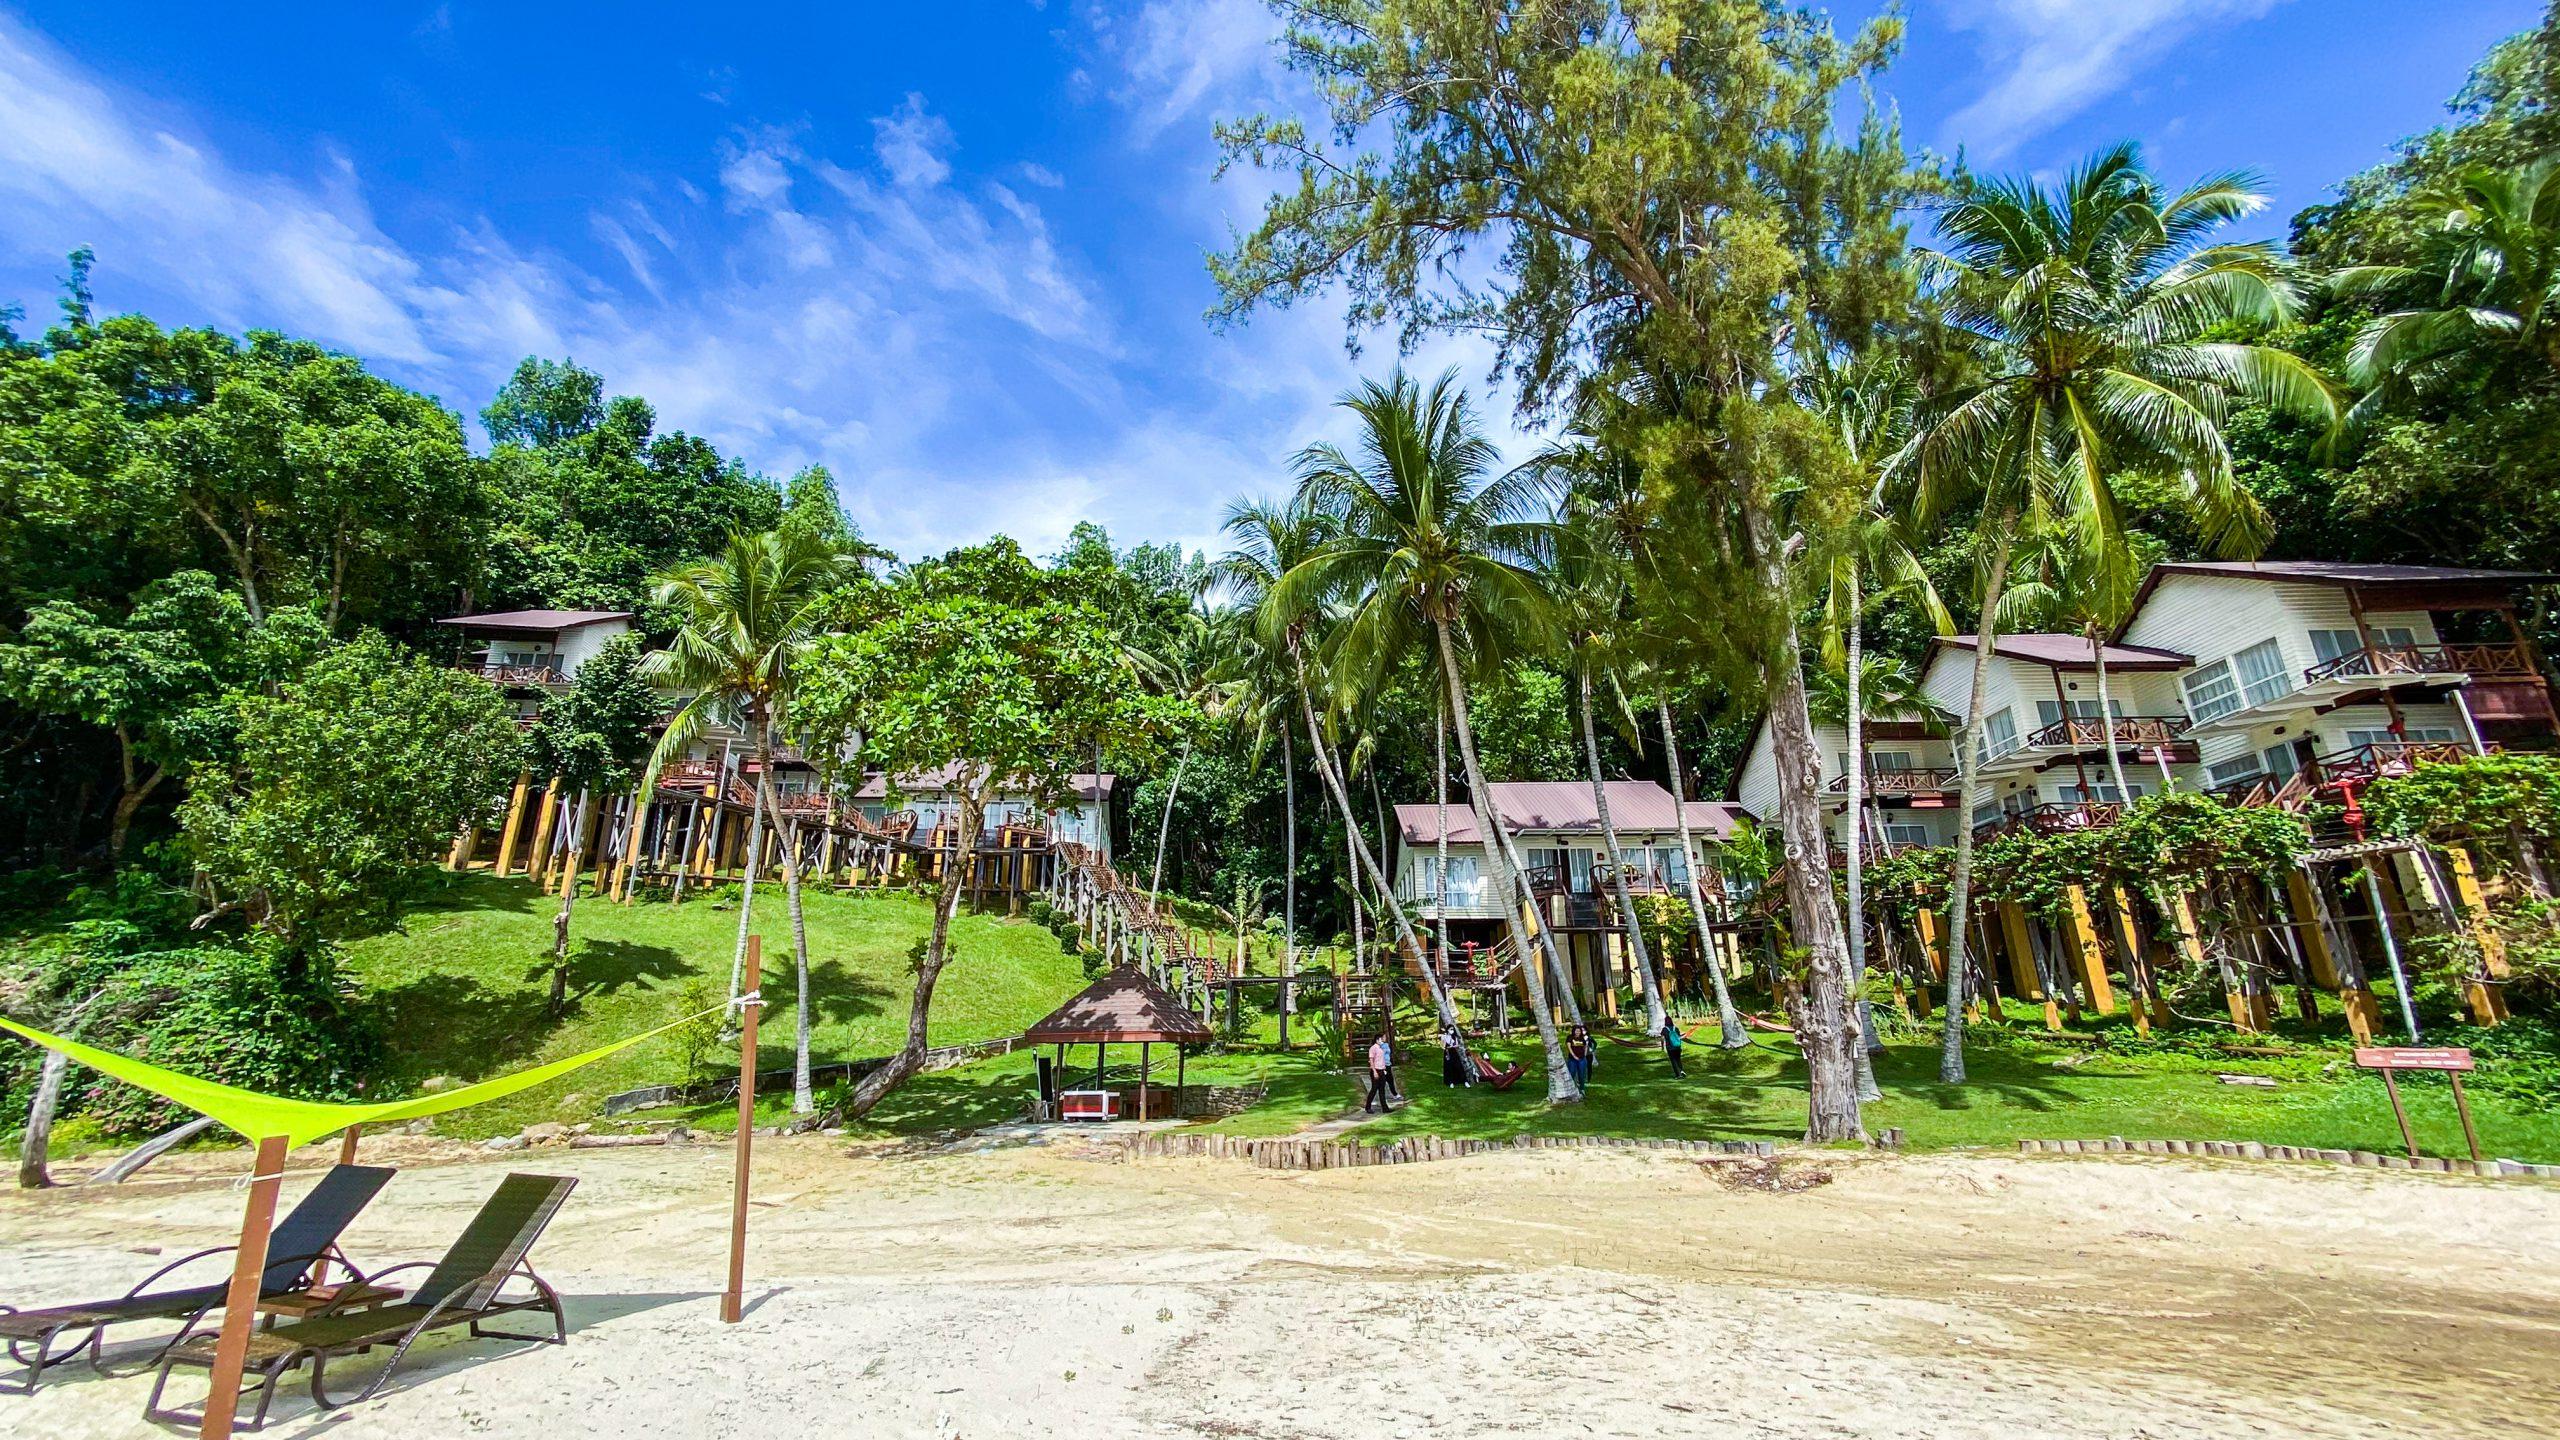 Tambun beach